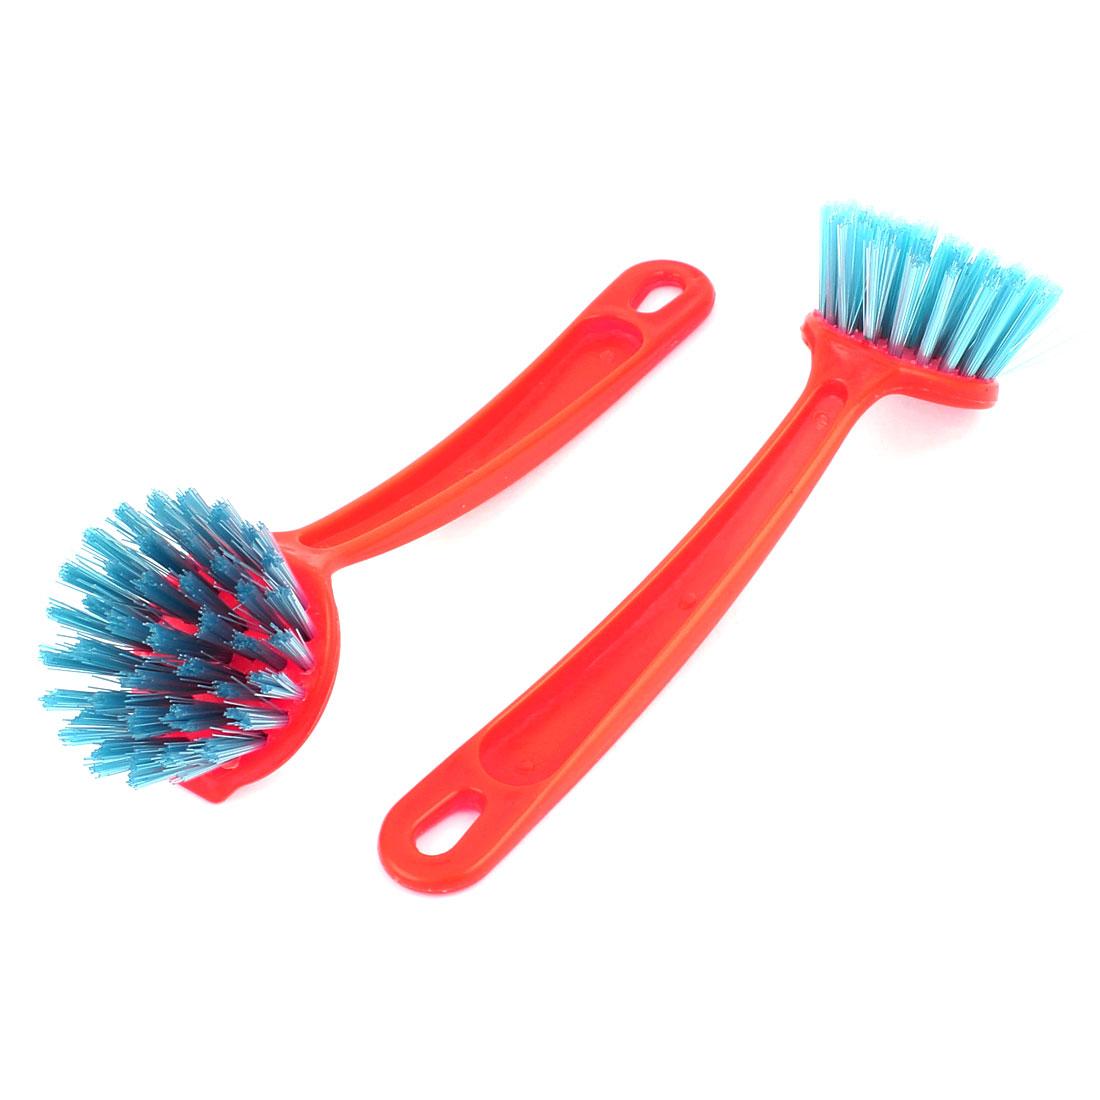 2 Pcs Kitchen Red Bristles Bowl Dish Pot Pan Cleaning Brush Scrubbers